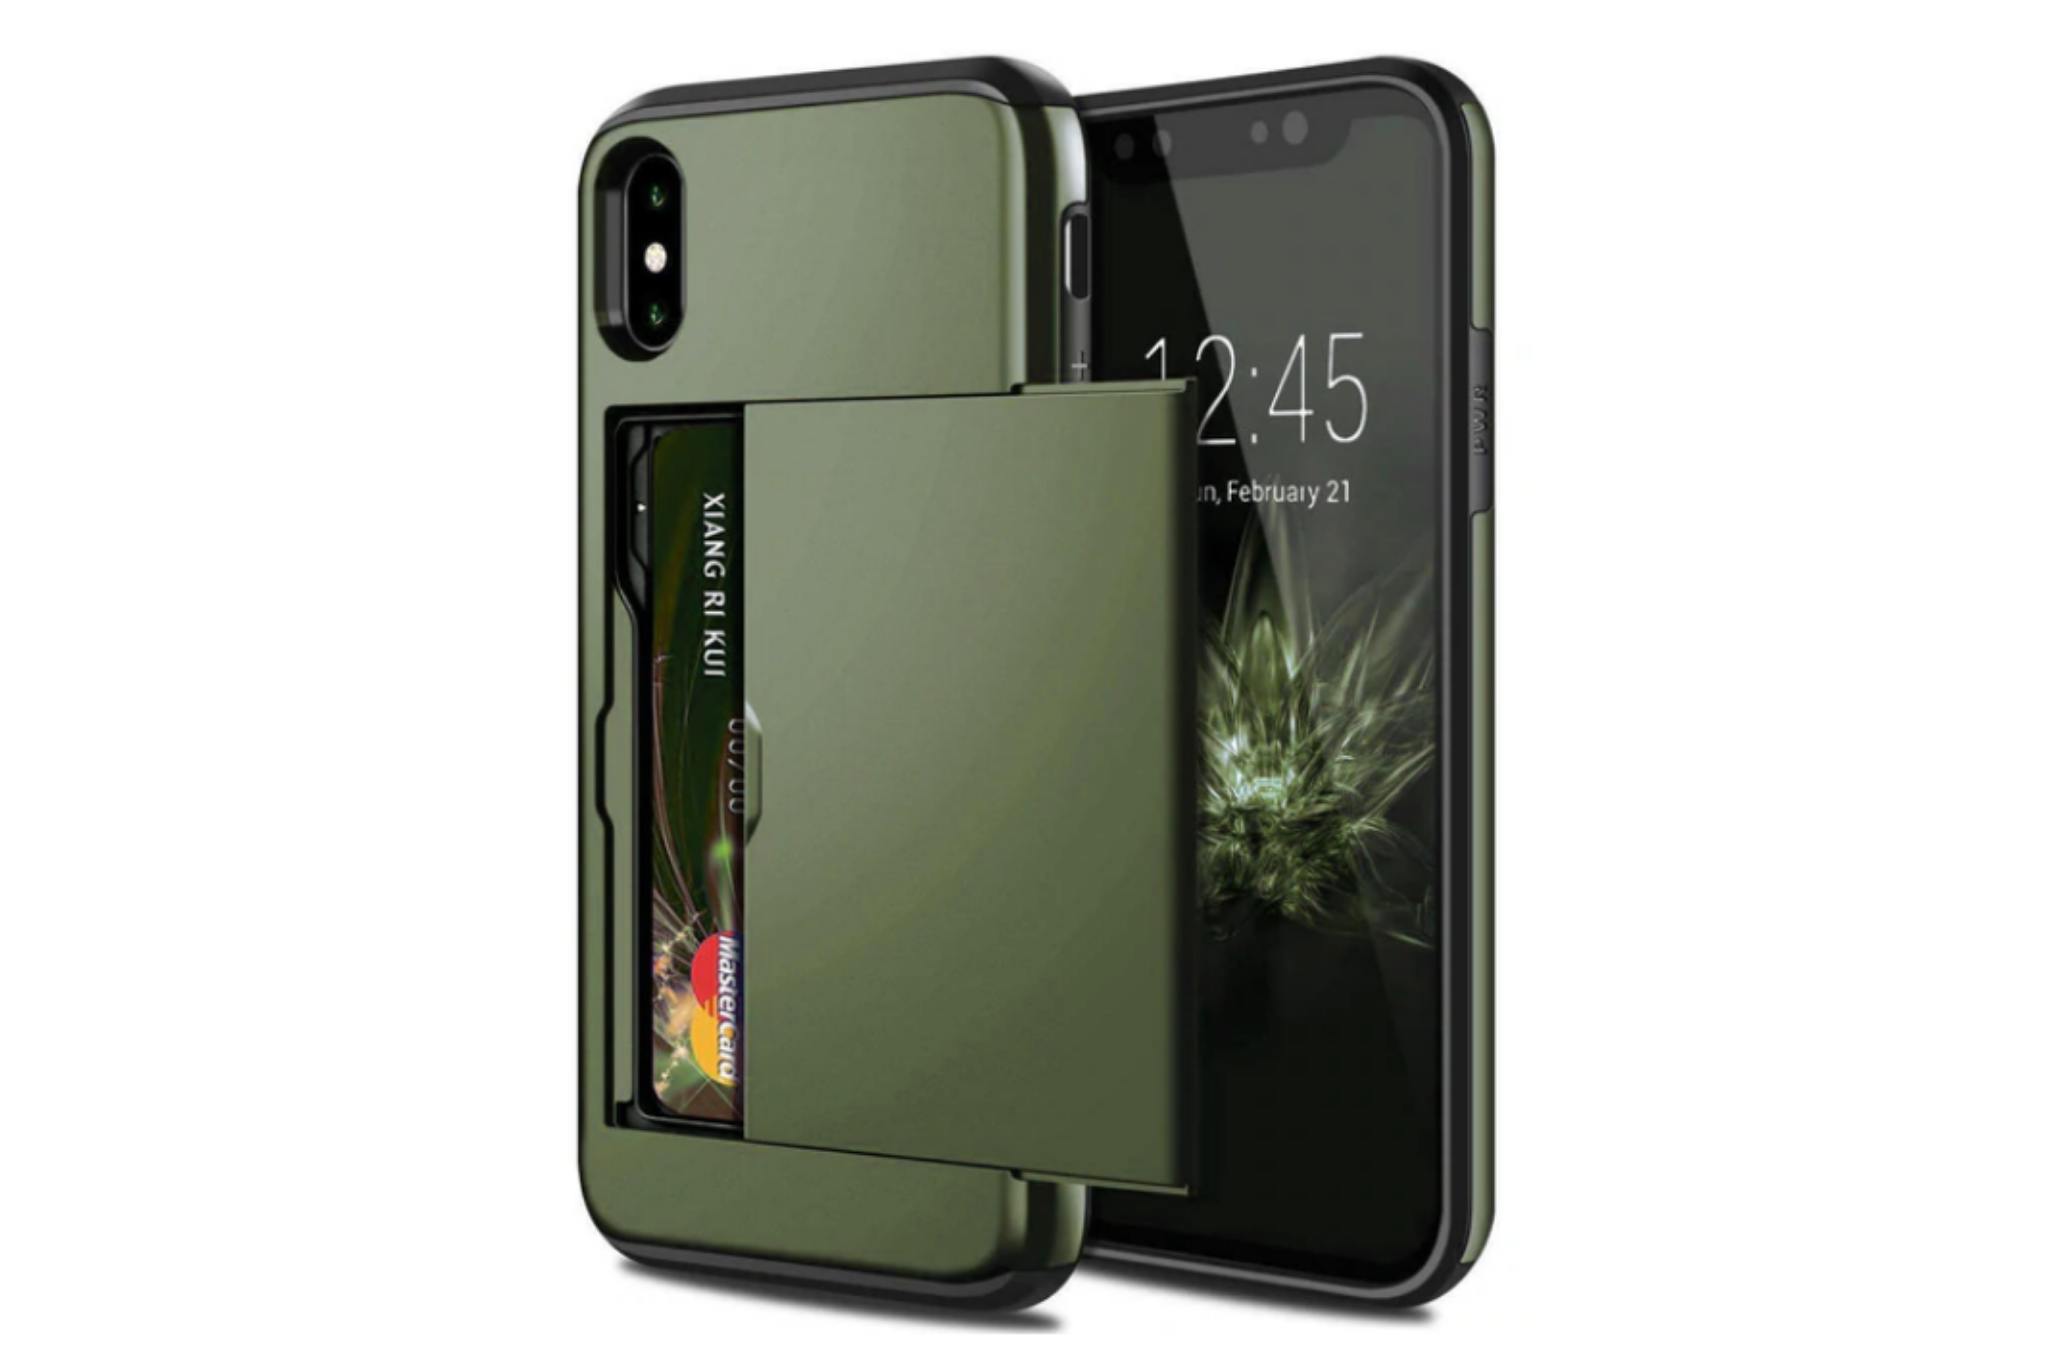 Smartphonehoesje iPhone X / XS   Pasjesschuif groen